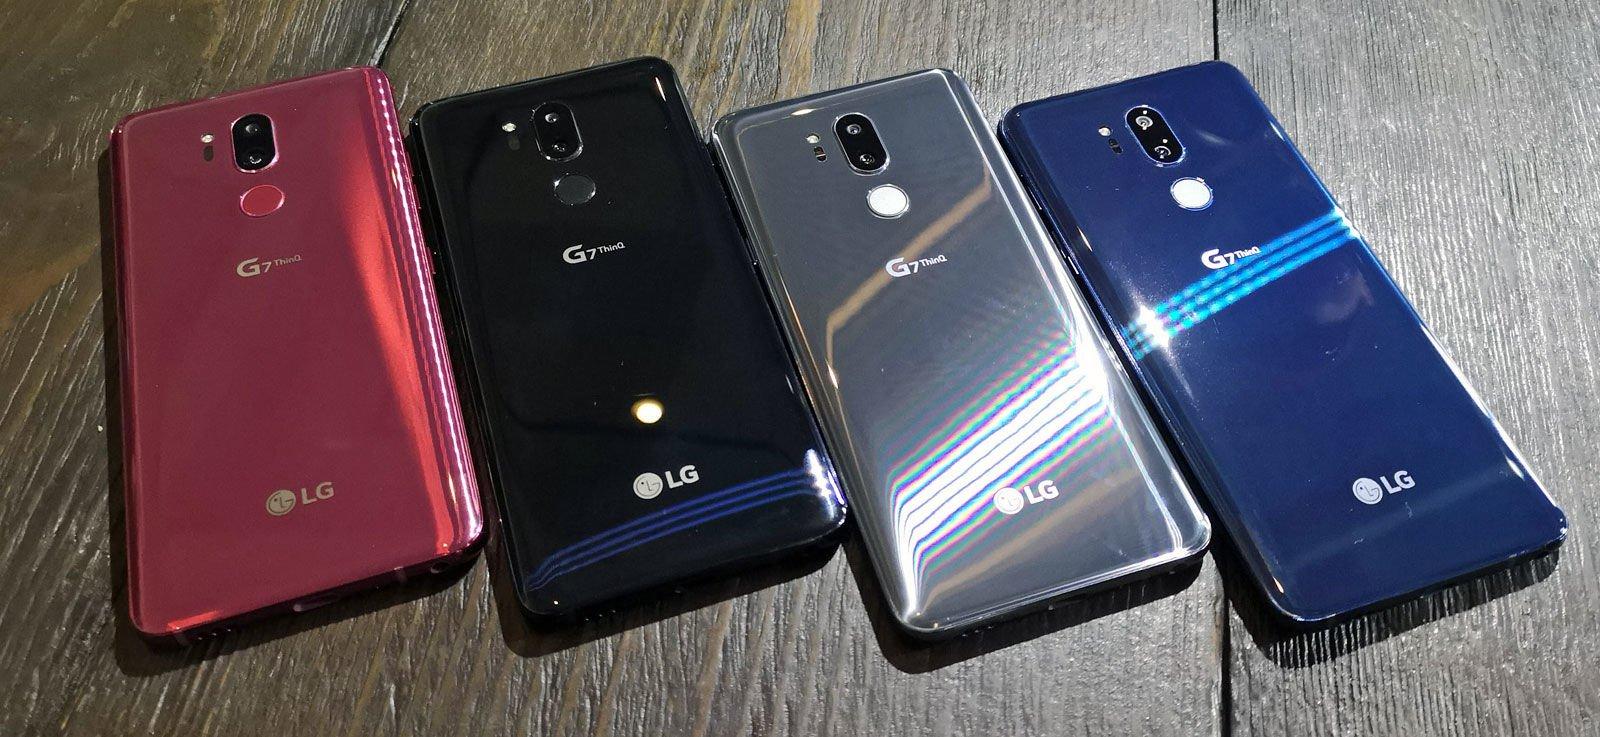 LG在韩发布LG G7 ThinQ第一个测试版Android 9 Pie